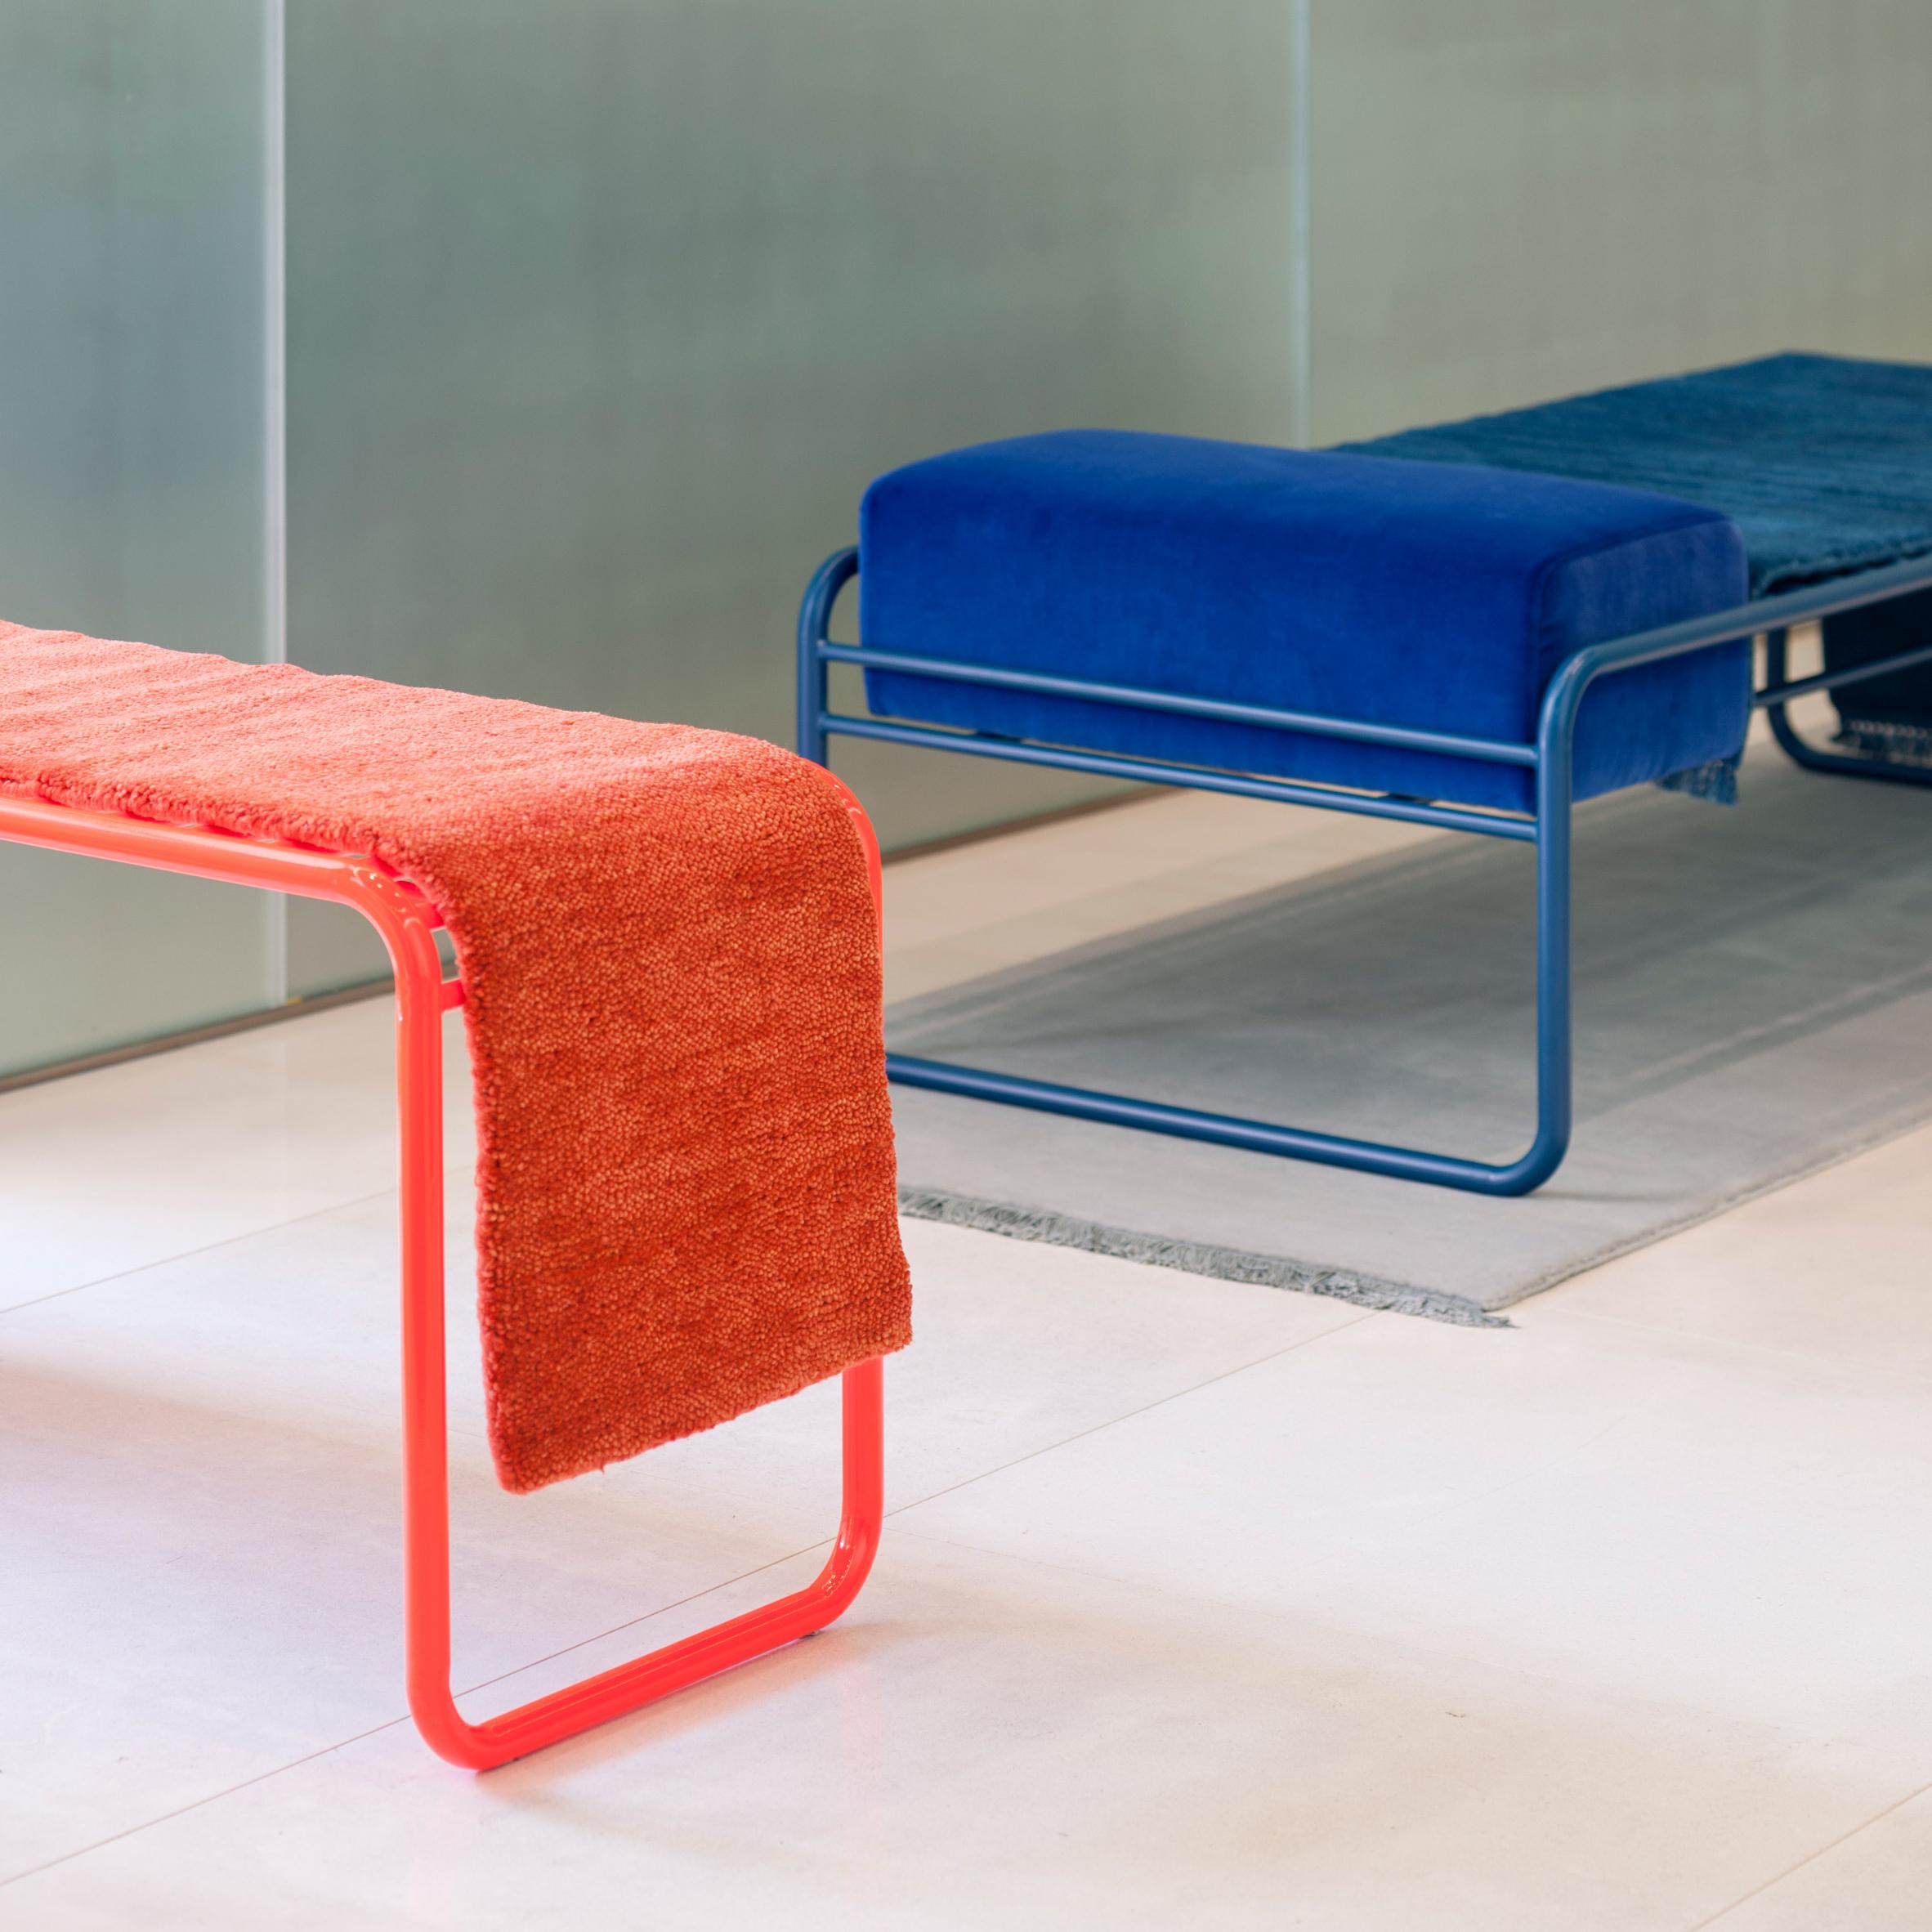 Katrin Greiling turns Kinnsand rugs into furniture